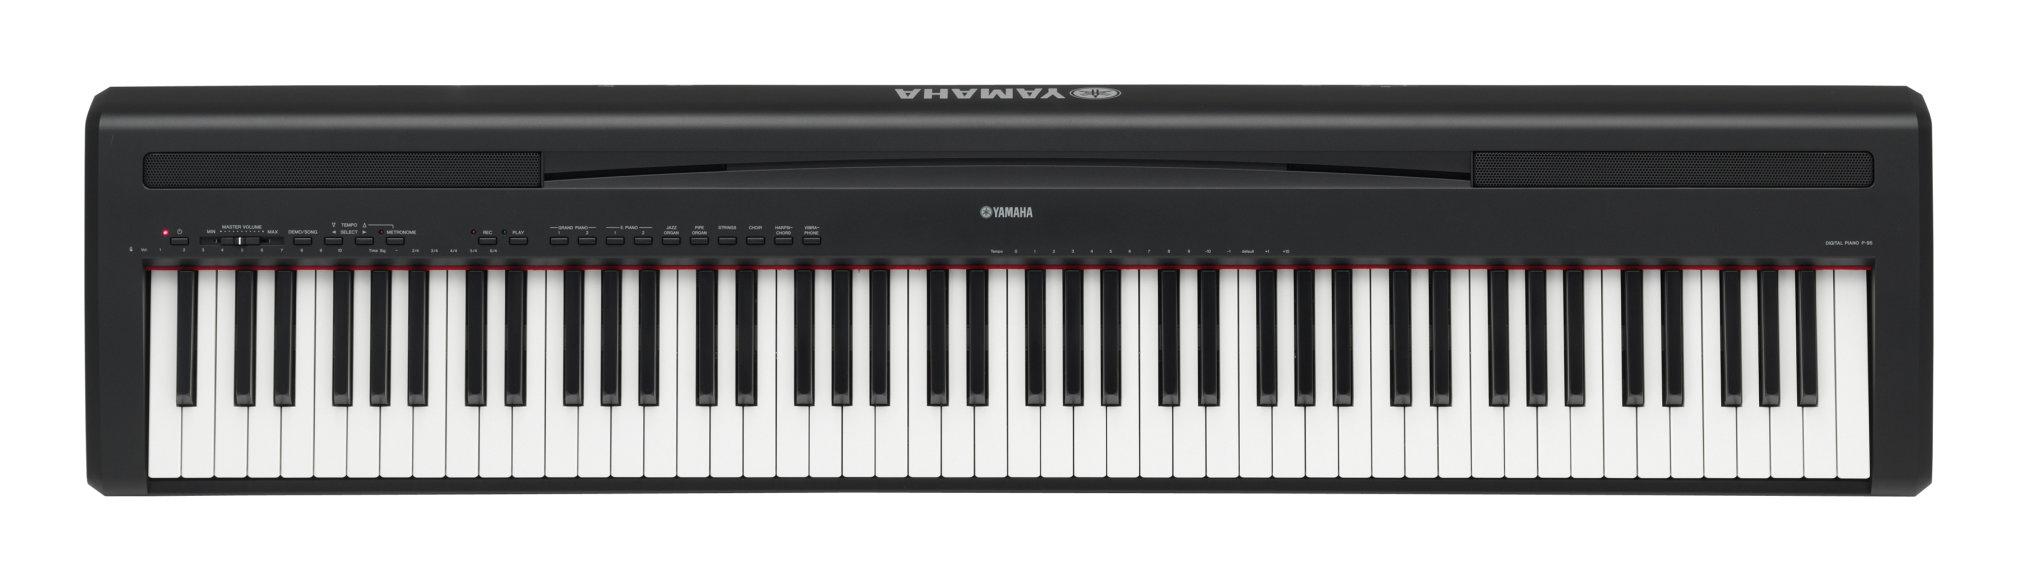 Yamaha P95 digitale stage piano huren